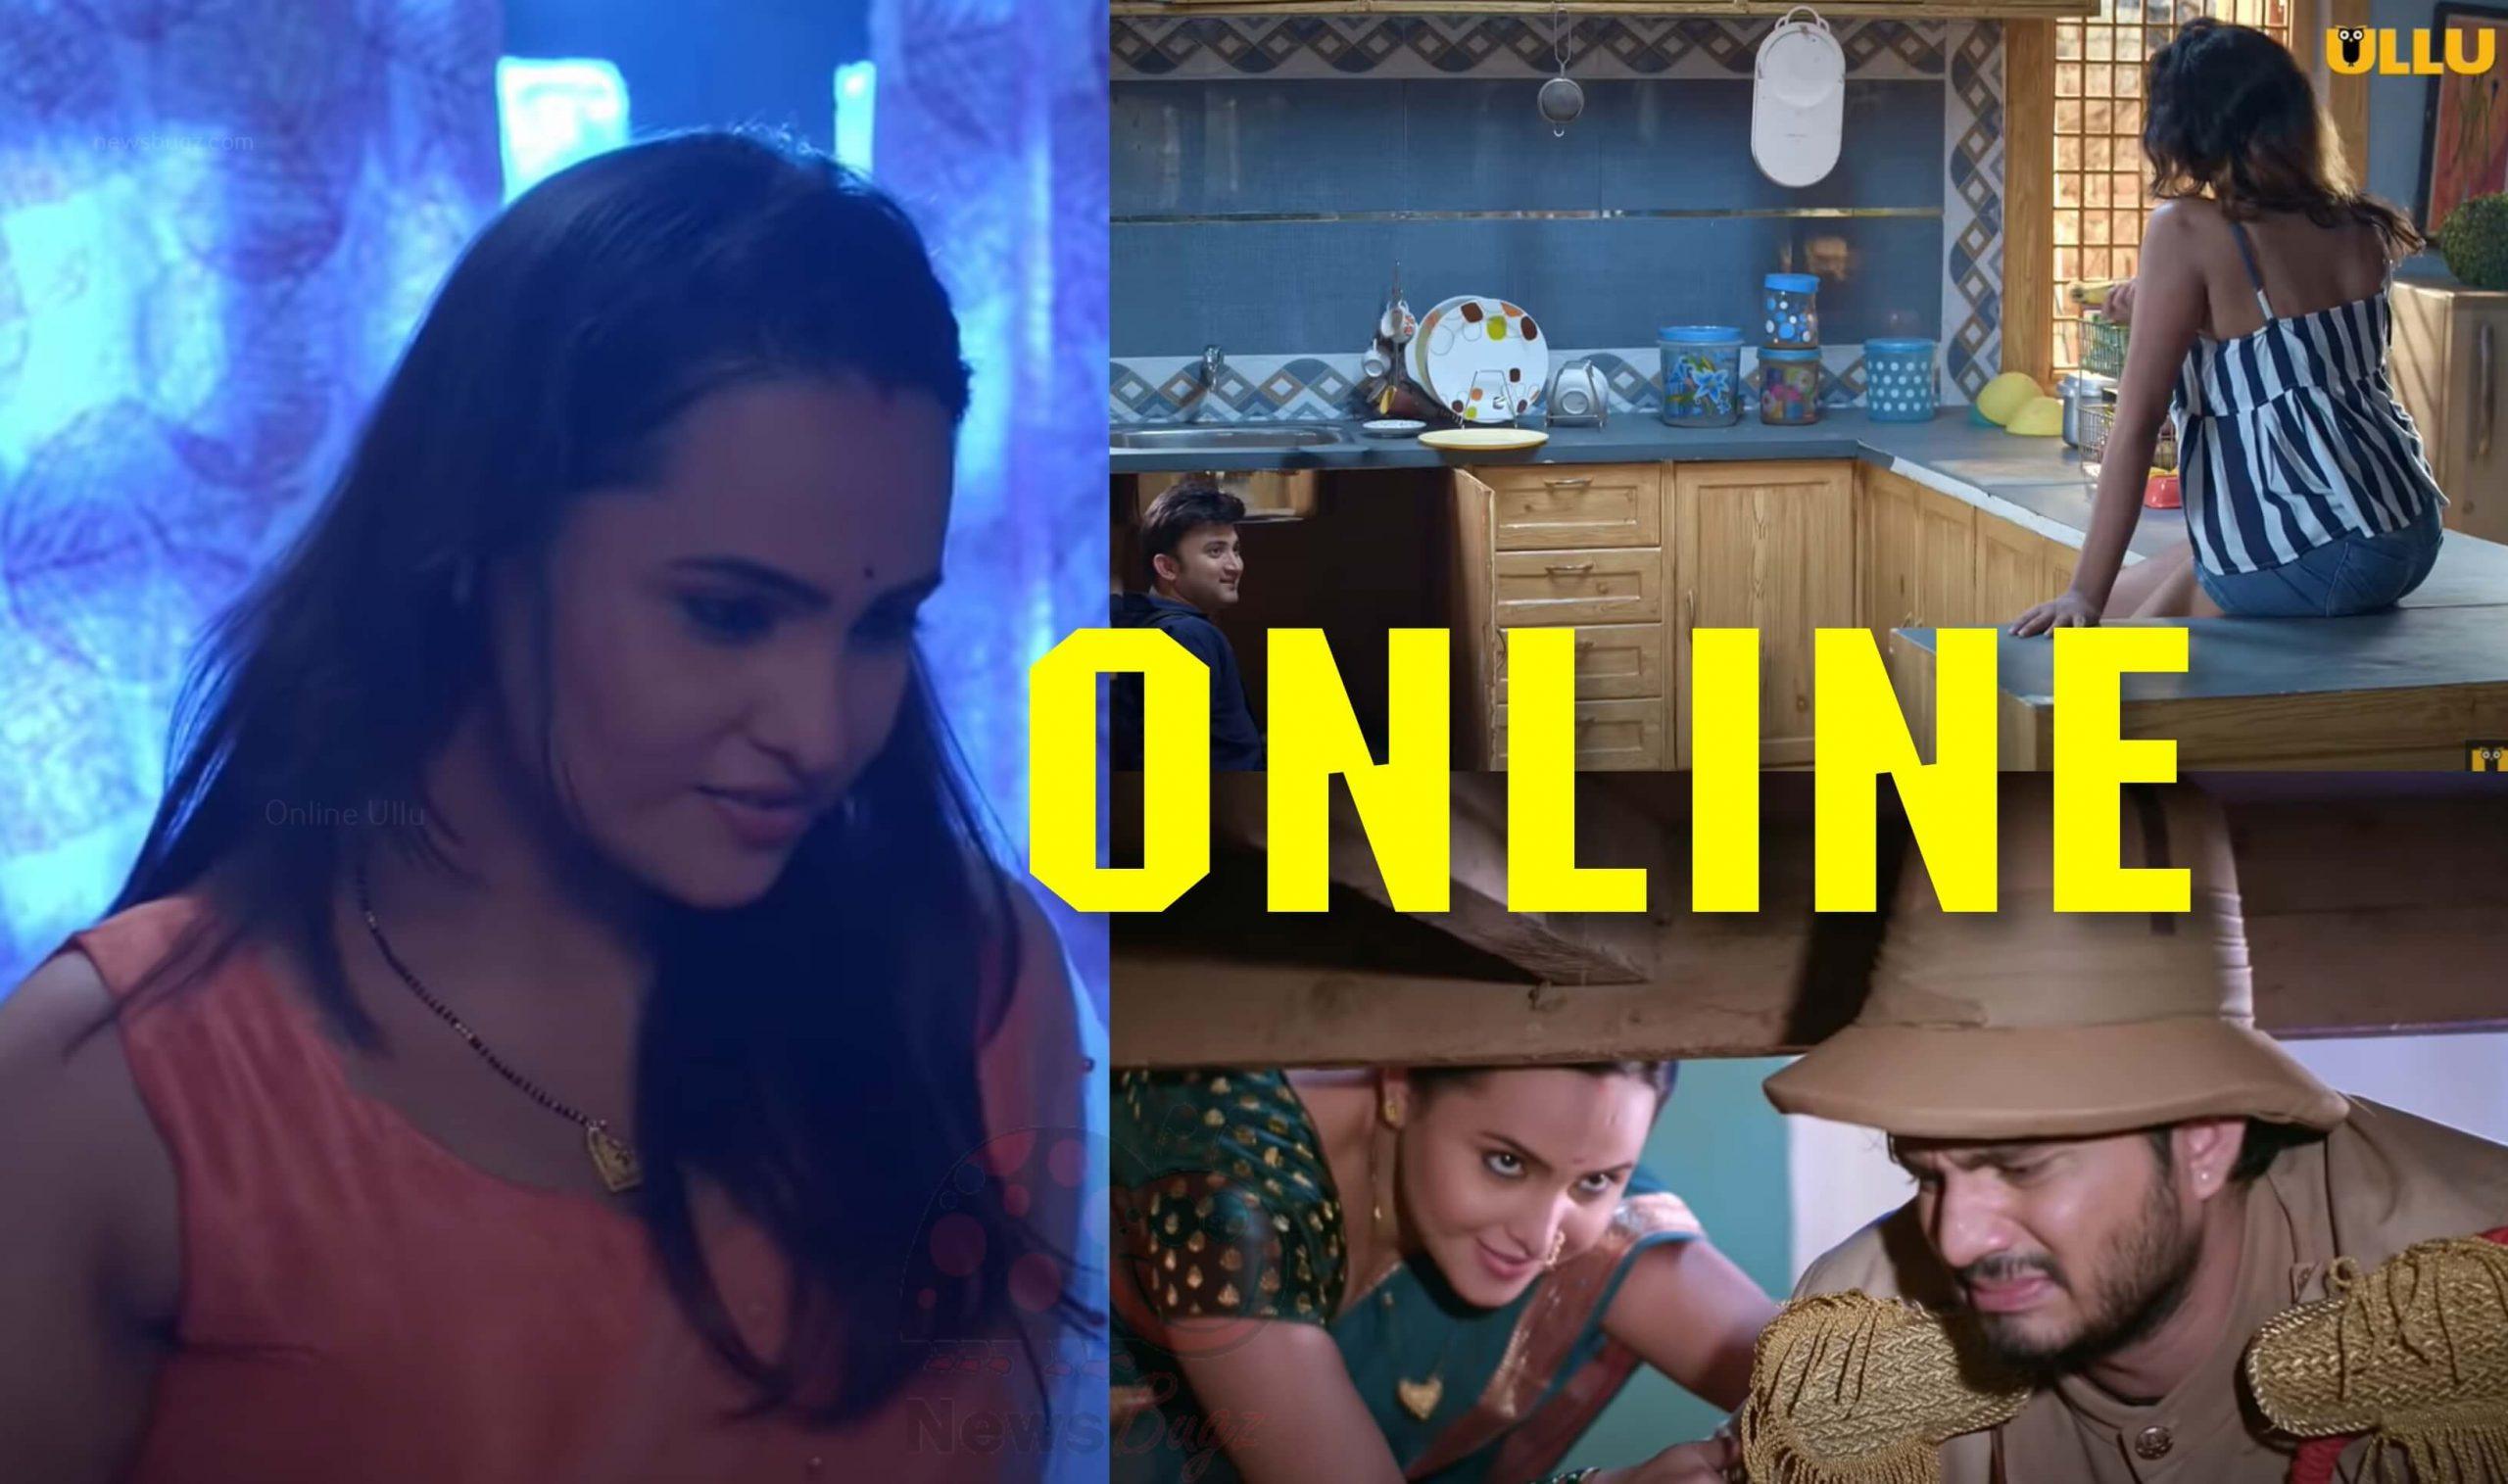 online ullu